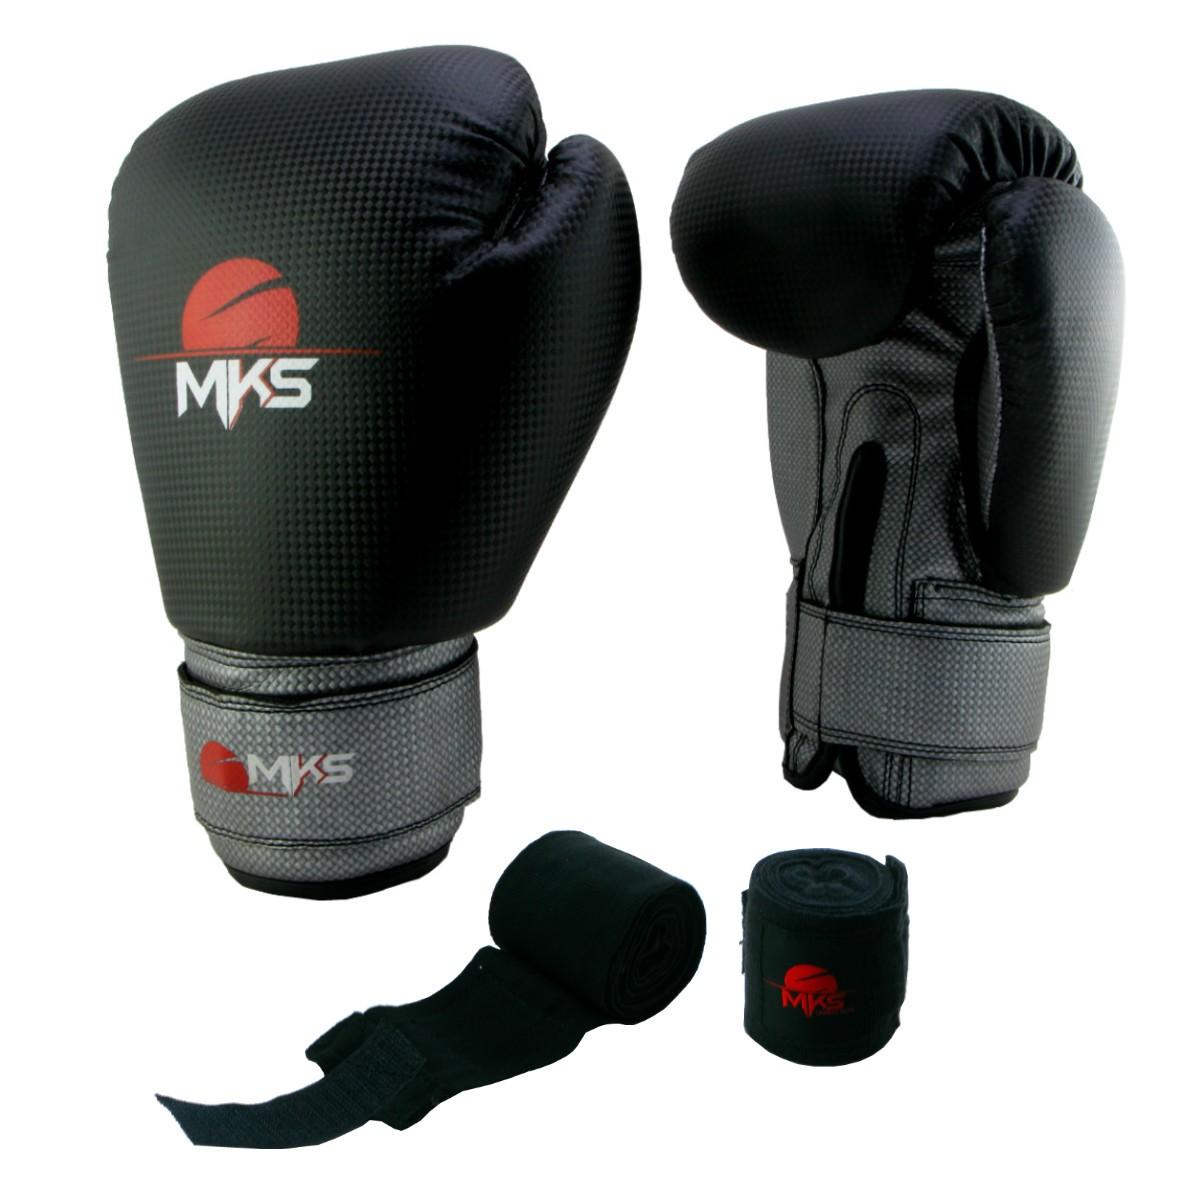 27d687e8a Luva de Boxe Prospect MKS Black   Silver 12 oz + bandagem